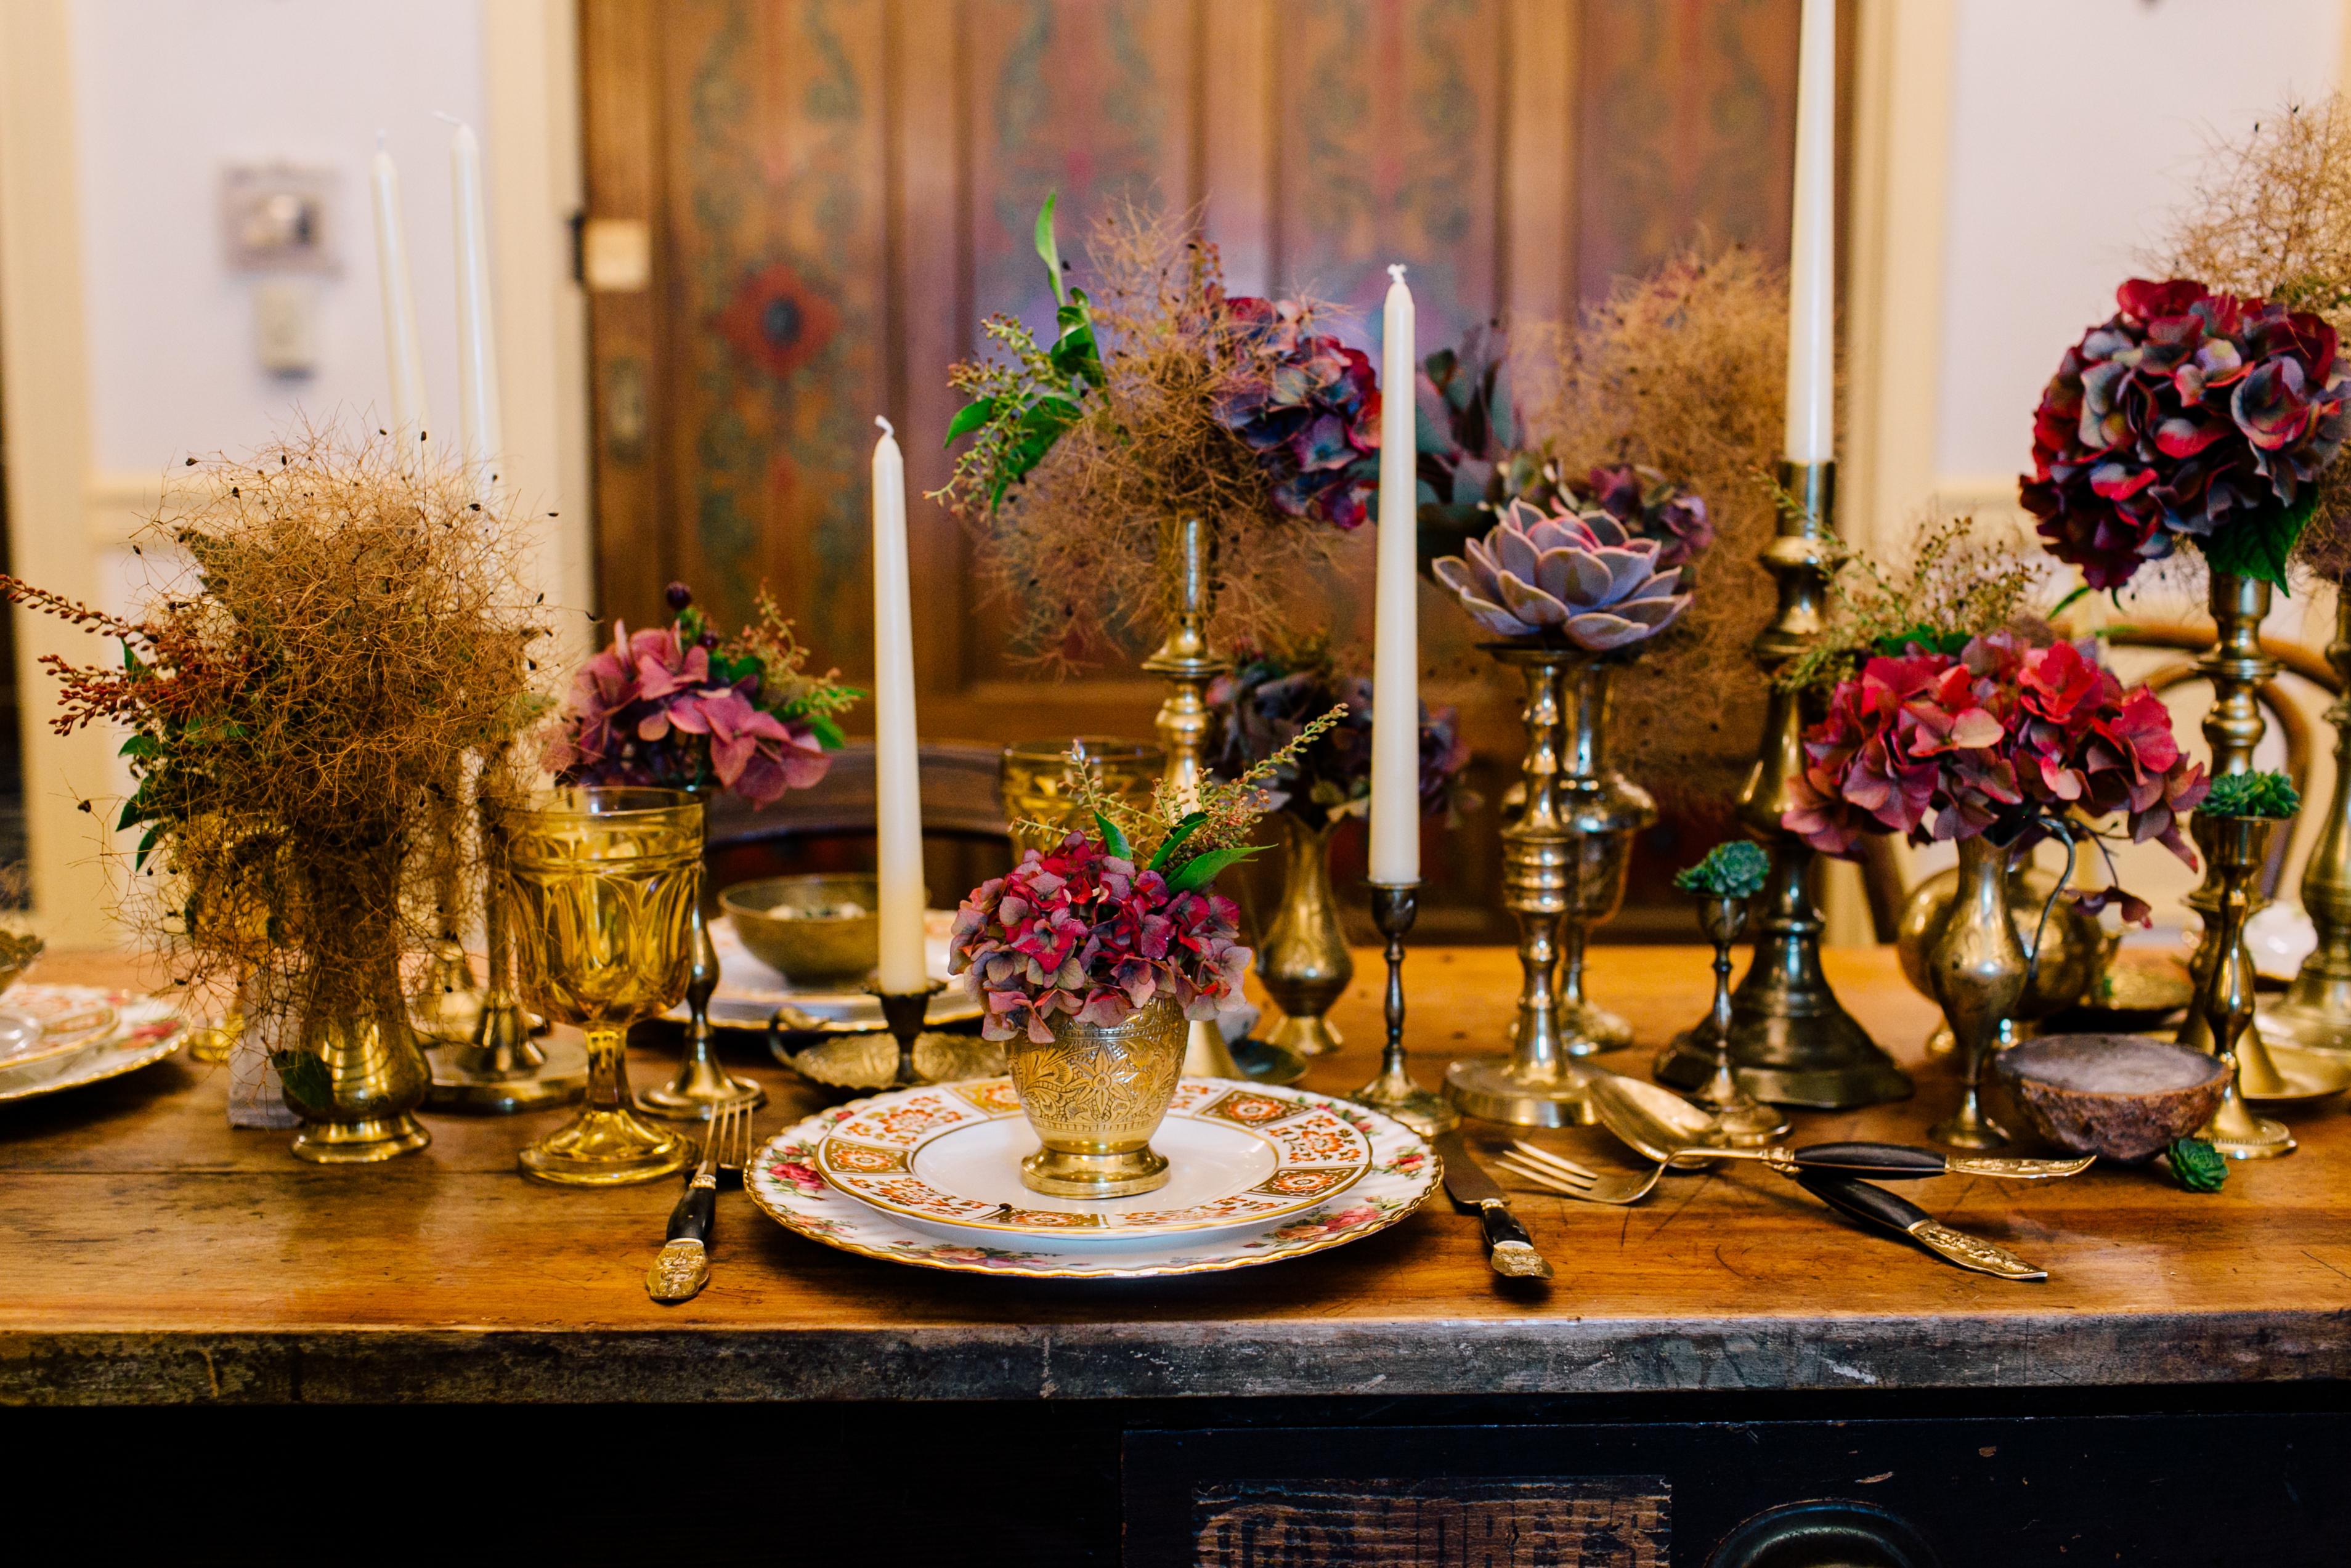 bellingham-leopold-crystal-ballroom-styled-wedding-katheryn-moran-photography-55